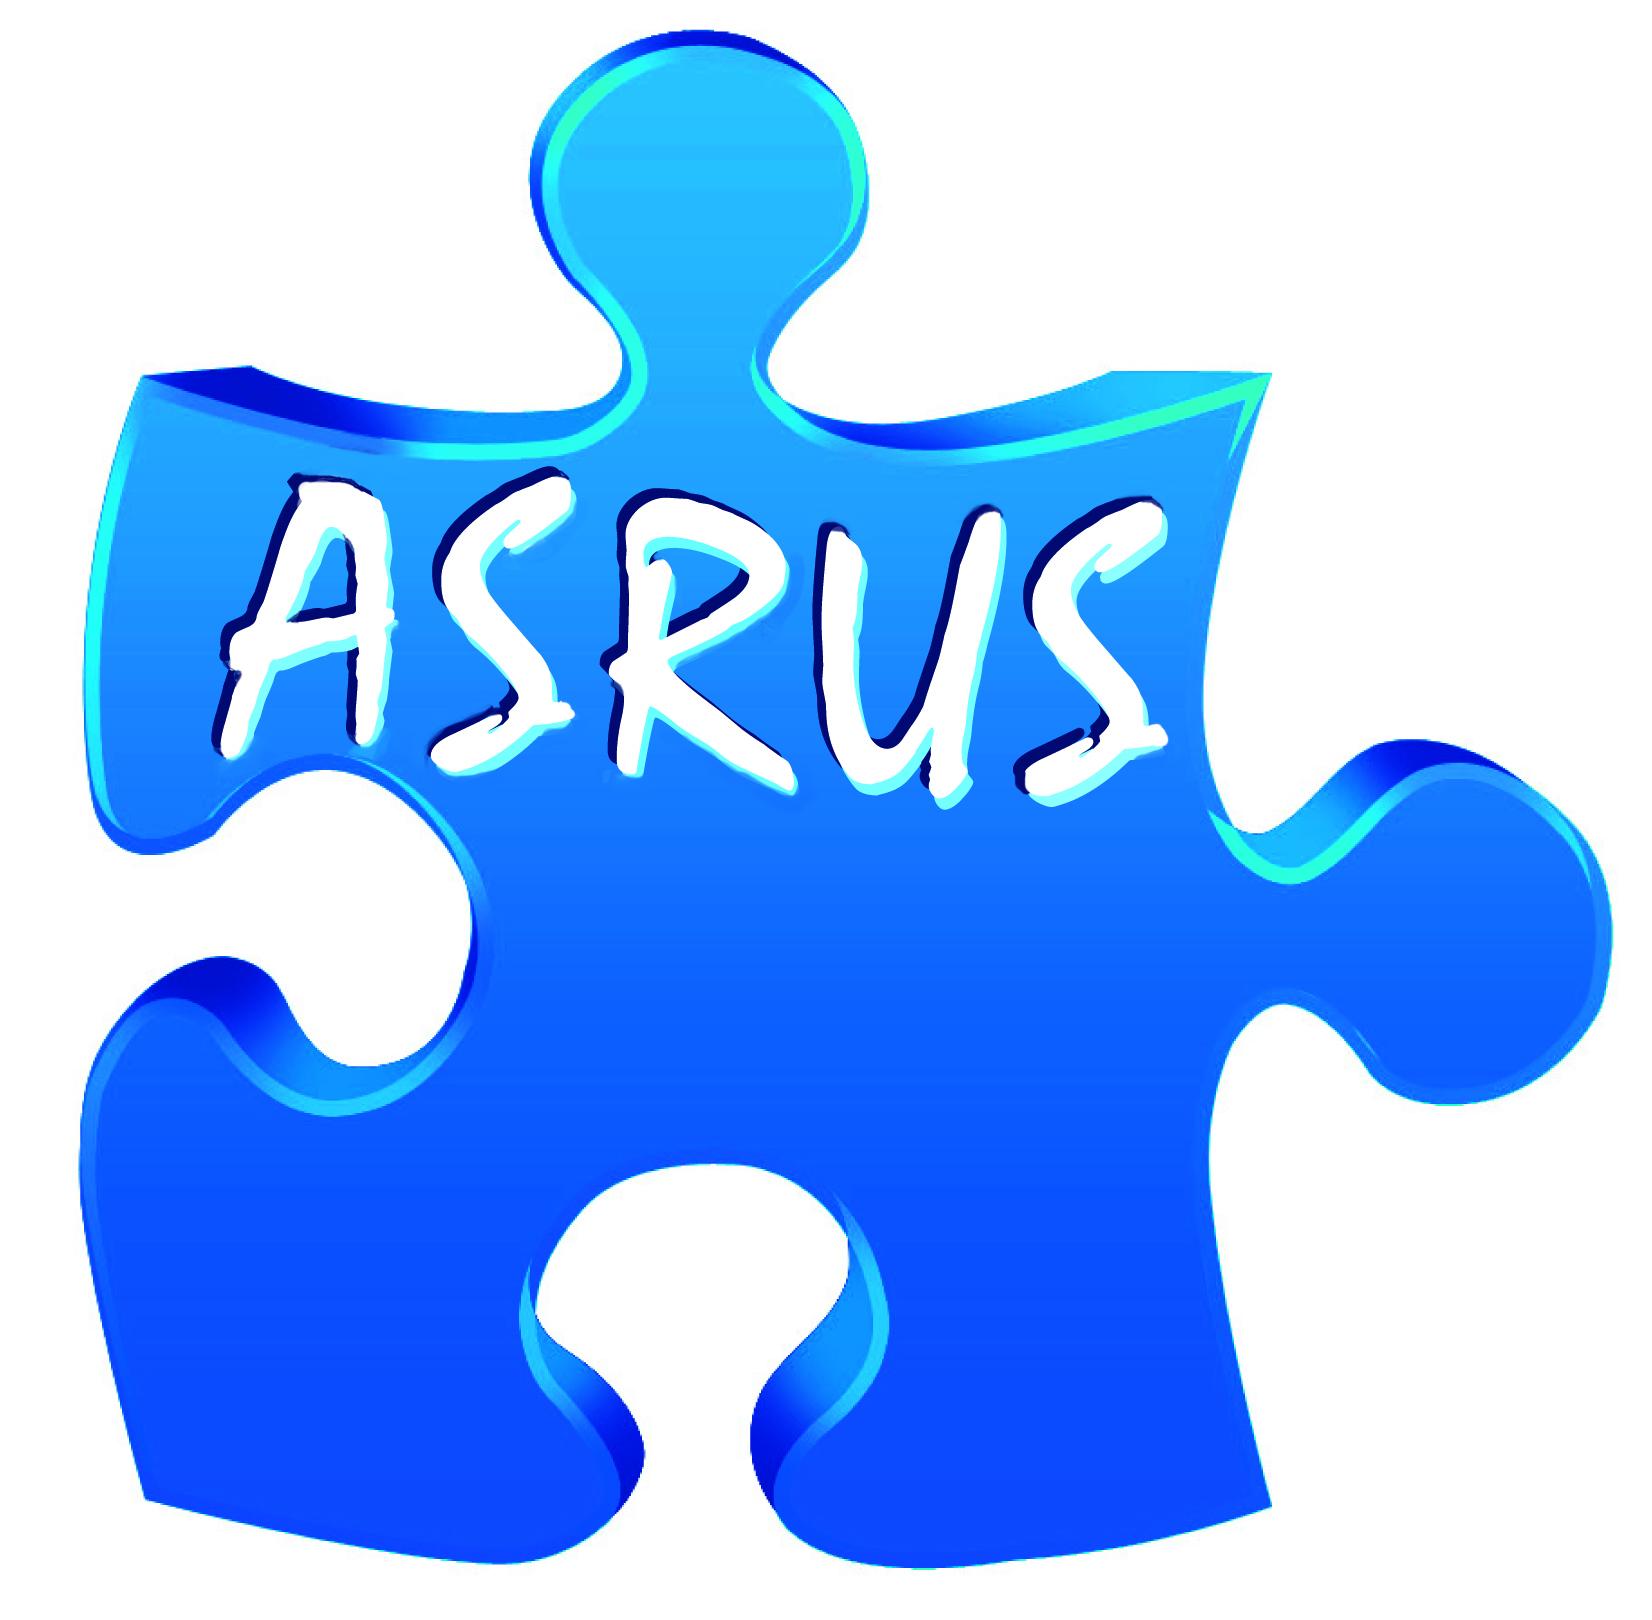 ASRUS (Aspergers R Us) Torbay.